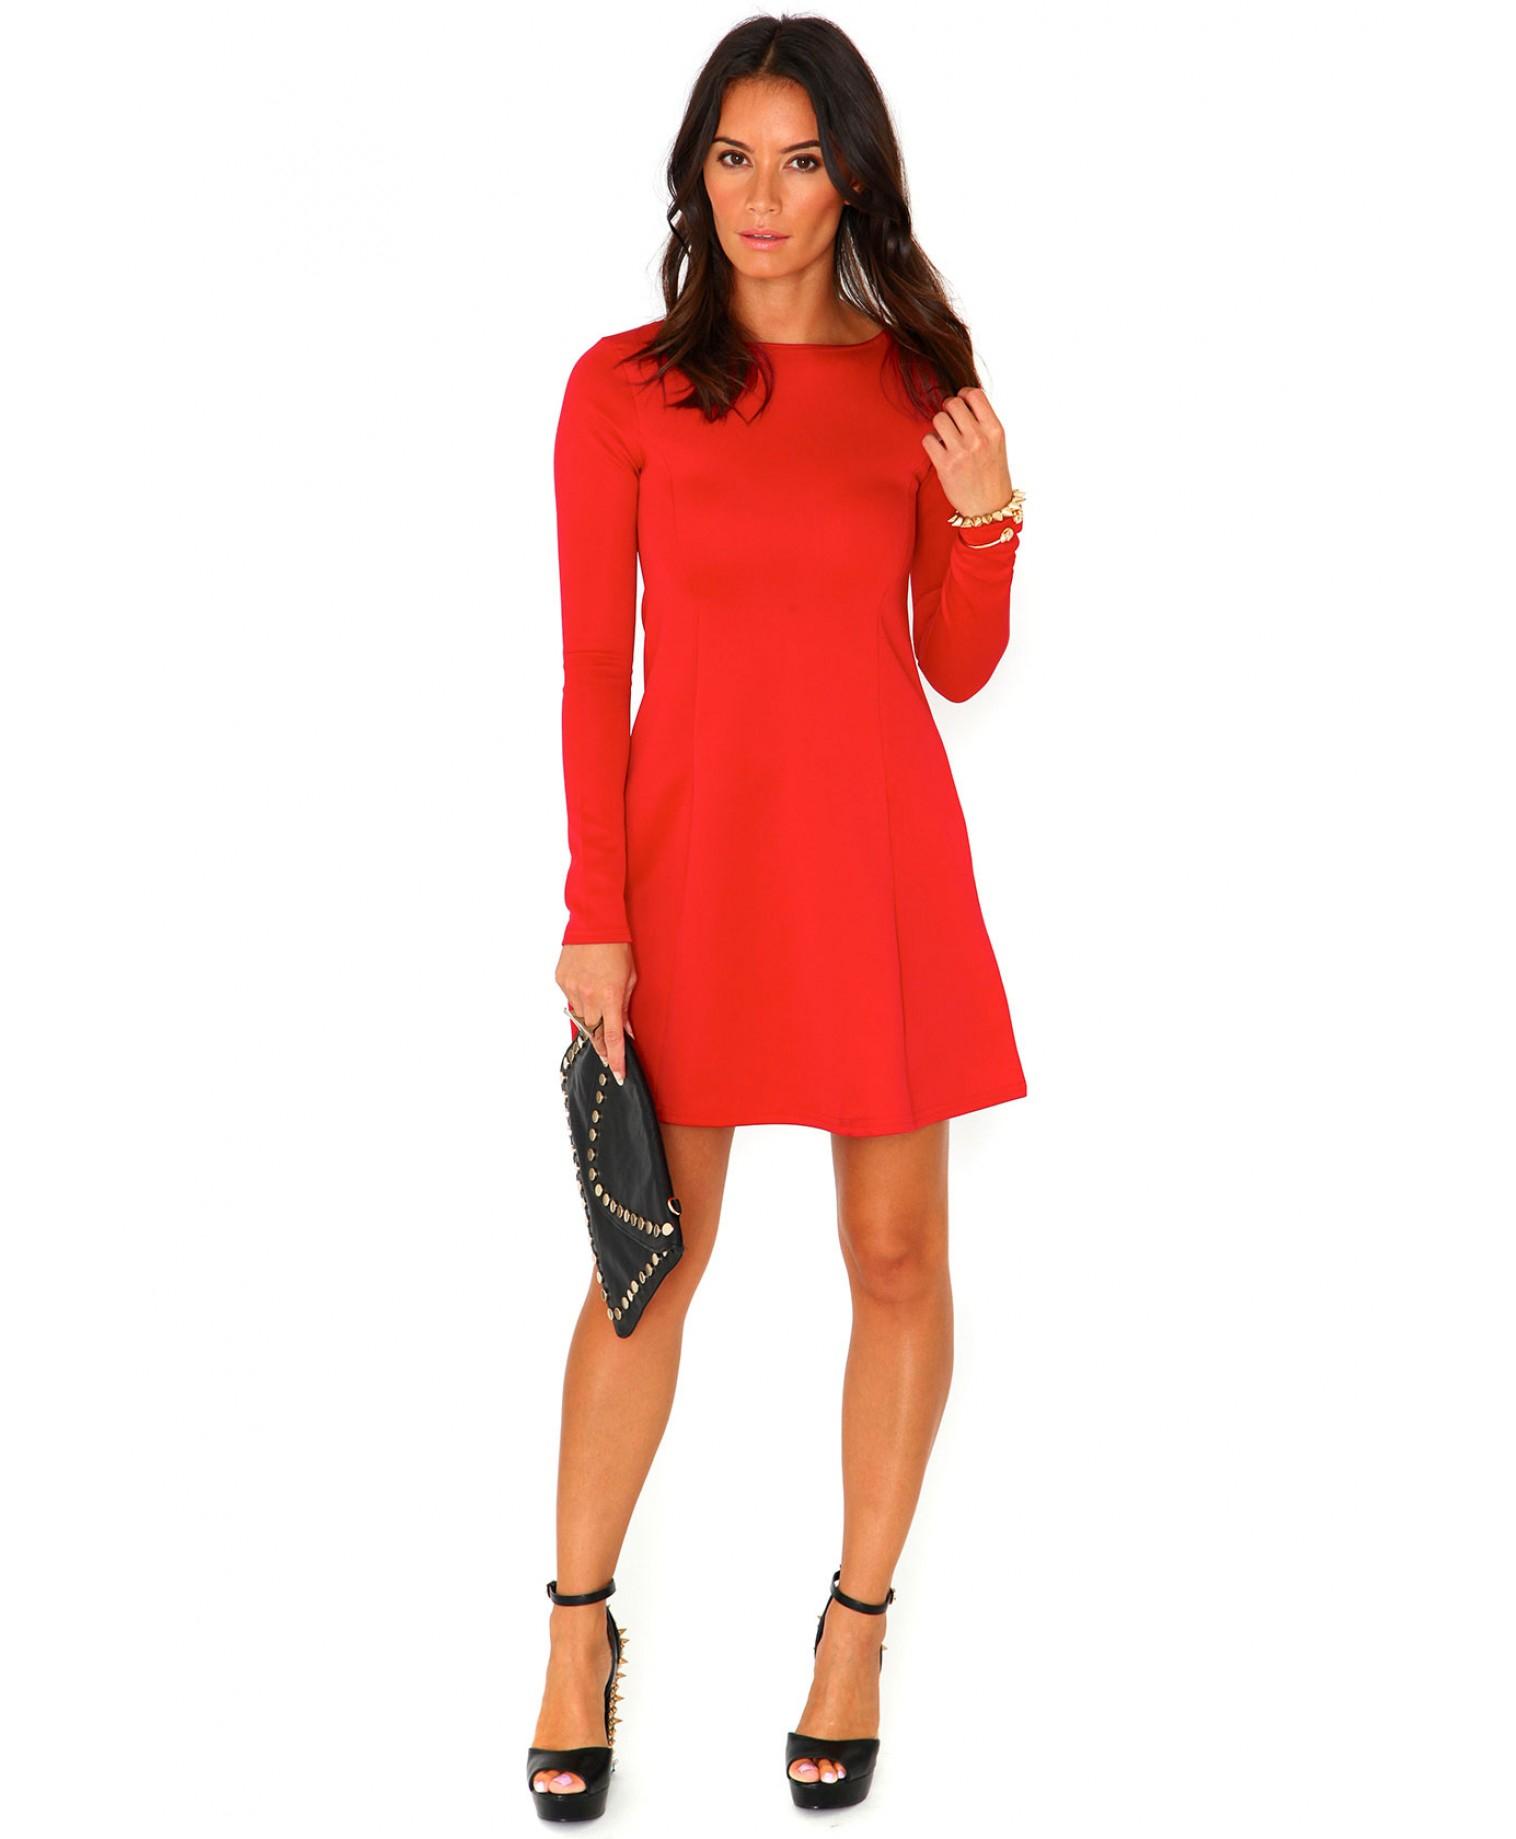 Long sleeve red dress